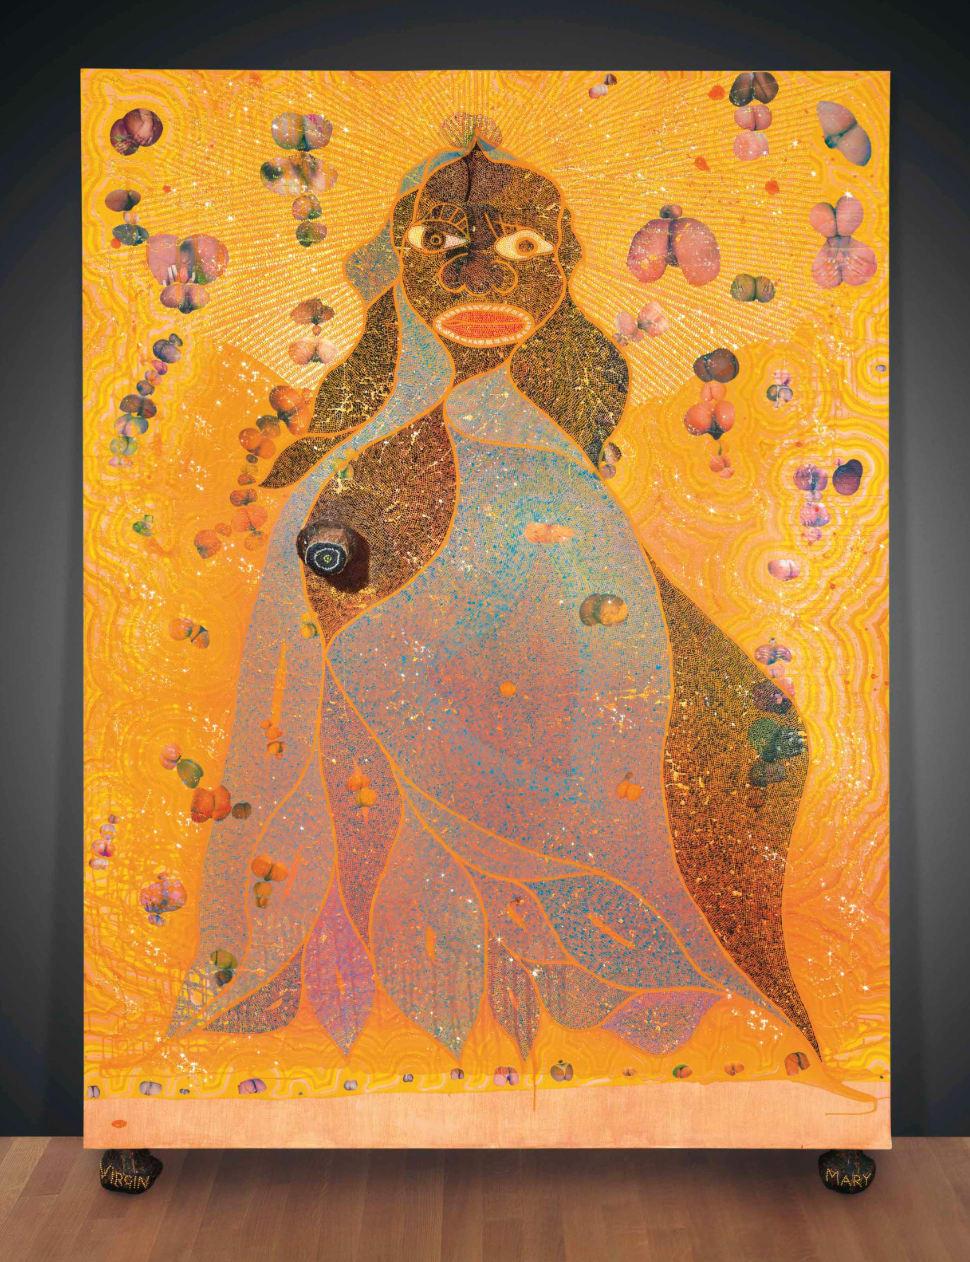 OFILI Chris, The Holy Virgin Mary, 1996